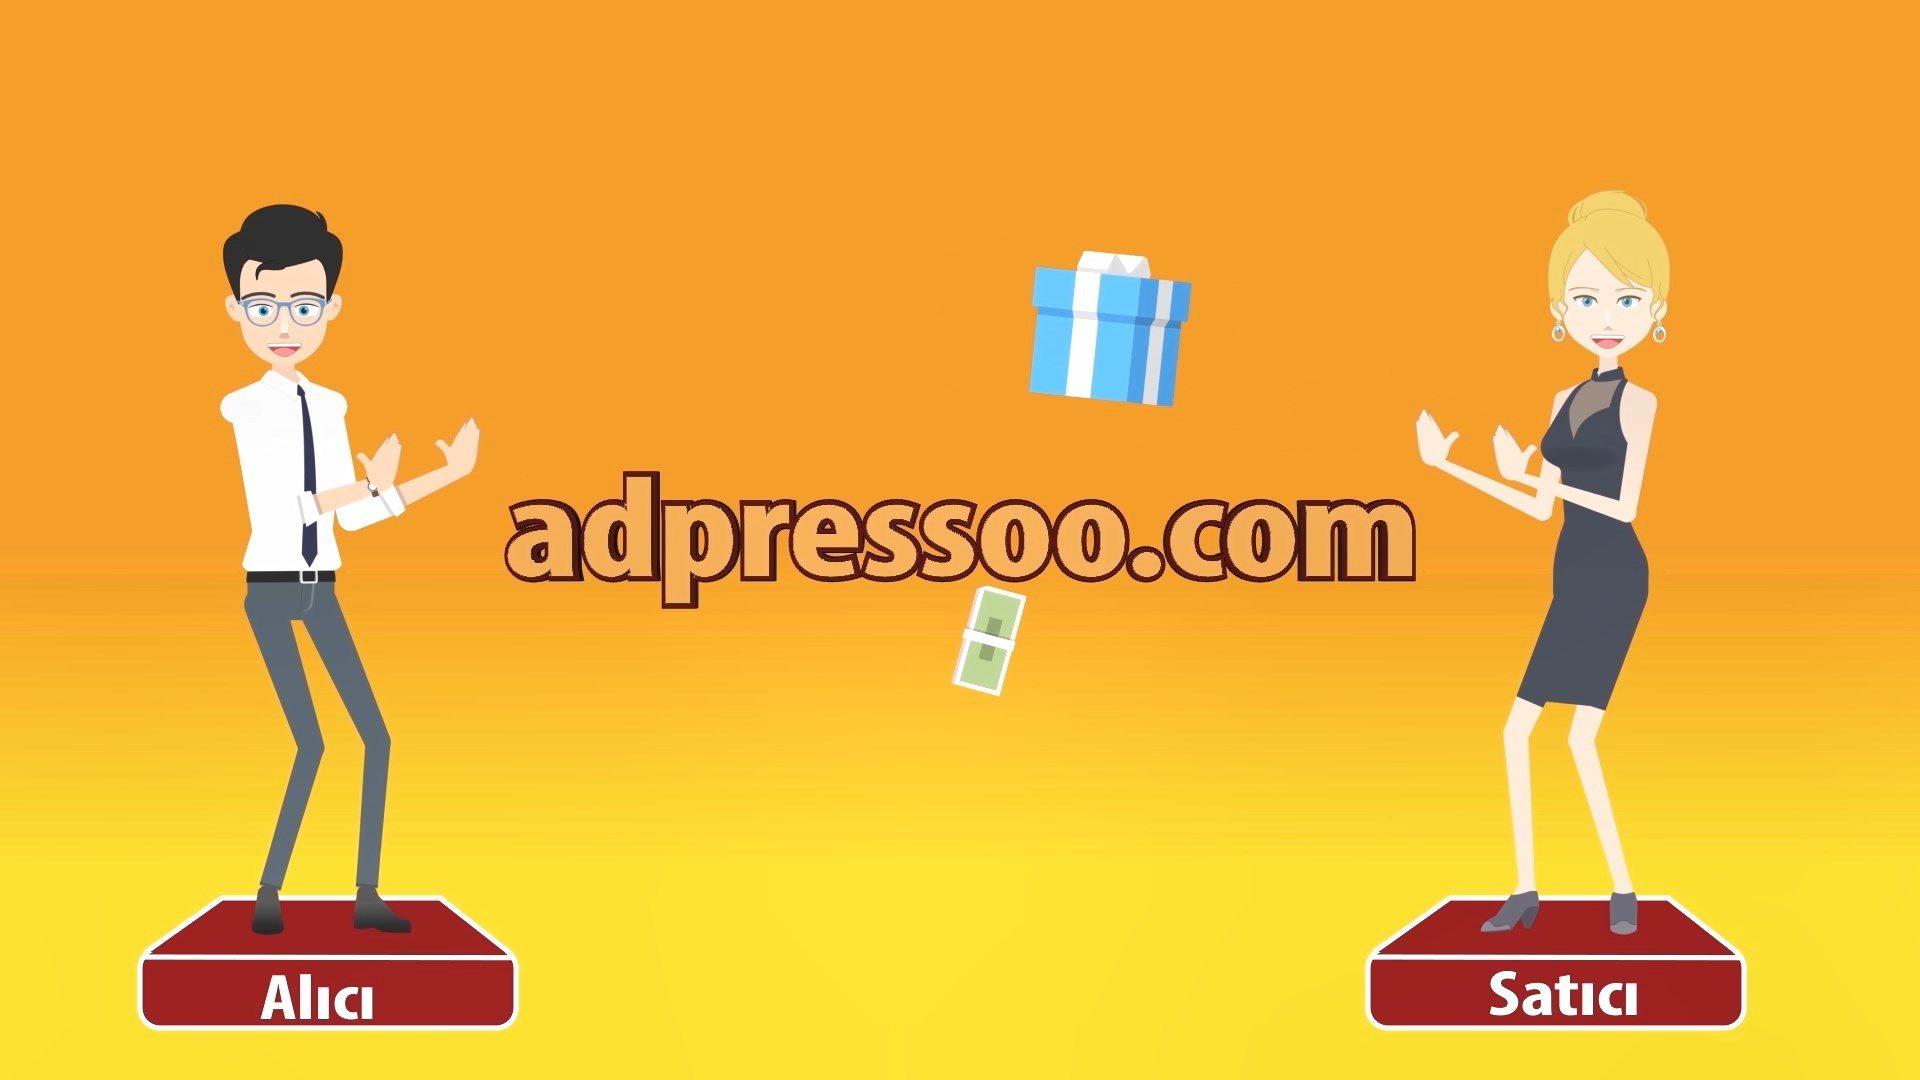 aspressoo.com 1 1920x1080 - ADPRESSOO TANITIM ANİMSYON FİLMİ